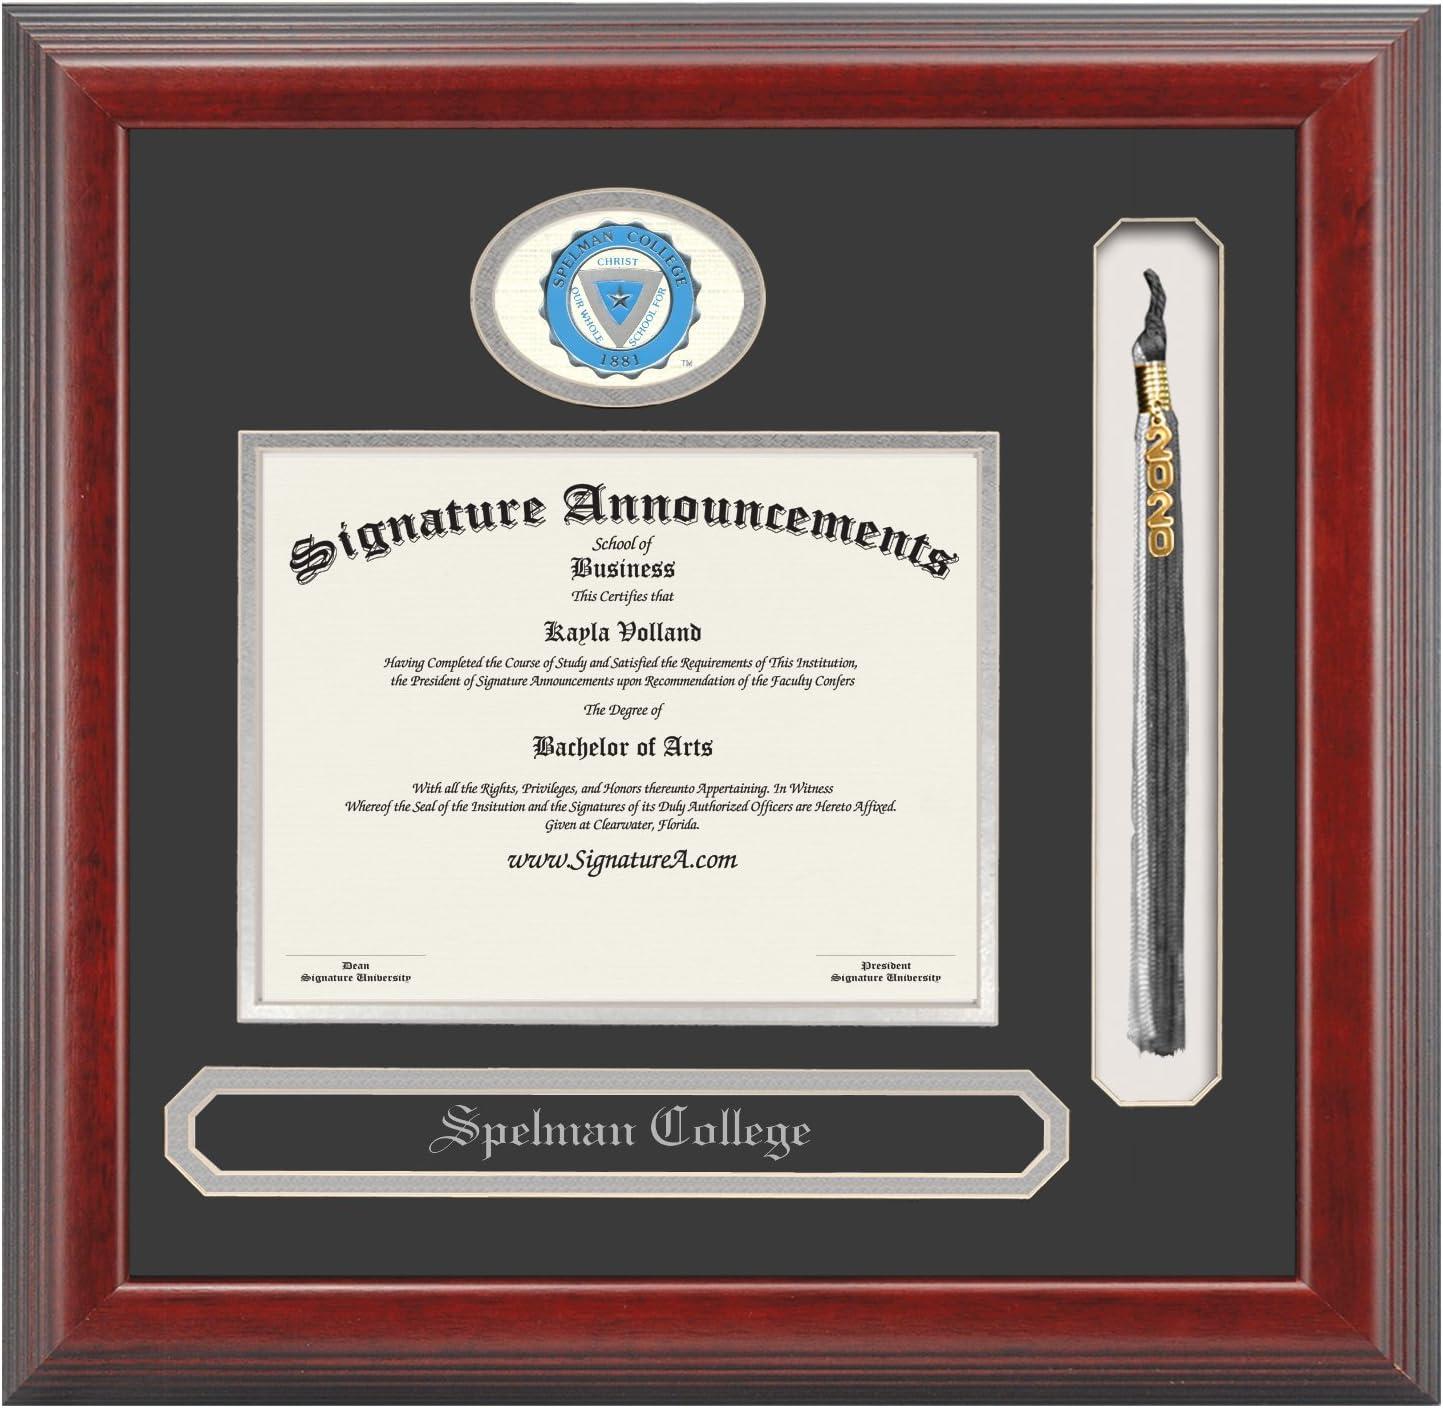 Name /& Tassel Graduation Diploma Frame Signature Announcements Spelman-College Undergraduate Professional//Doctor Sculpted Foil Seal Cherry 16 x 16